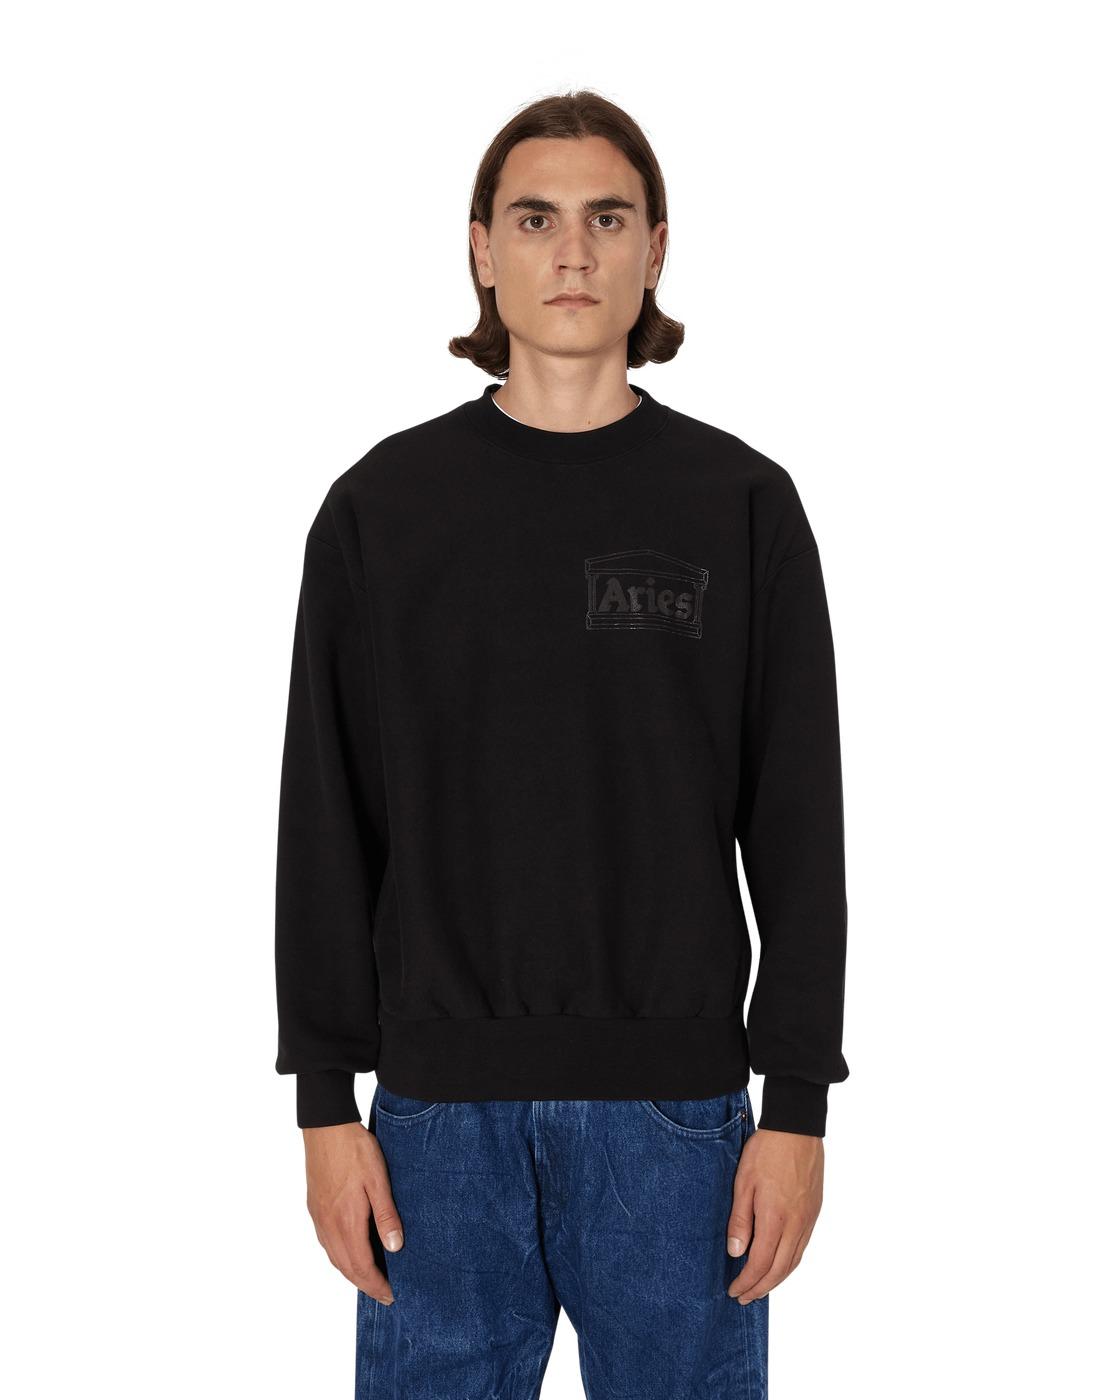 Aries Premium Temple Crewneck Sweatshirt Black